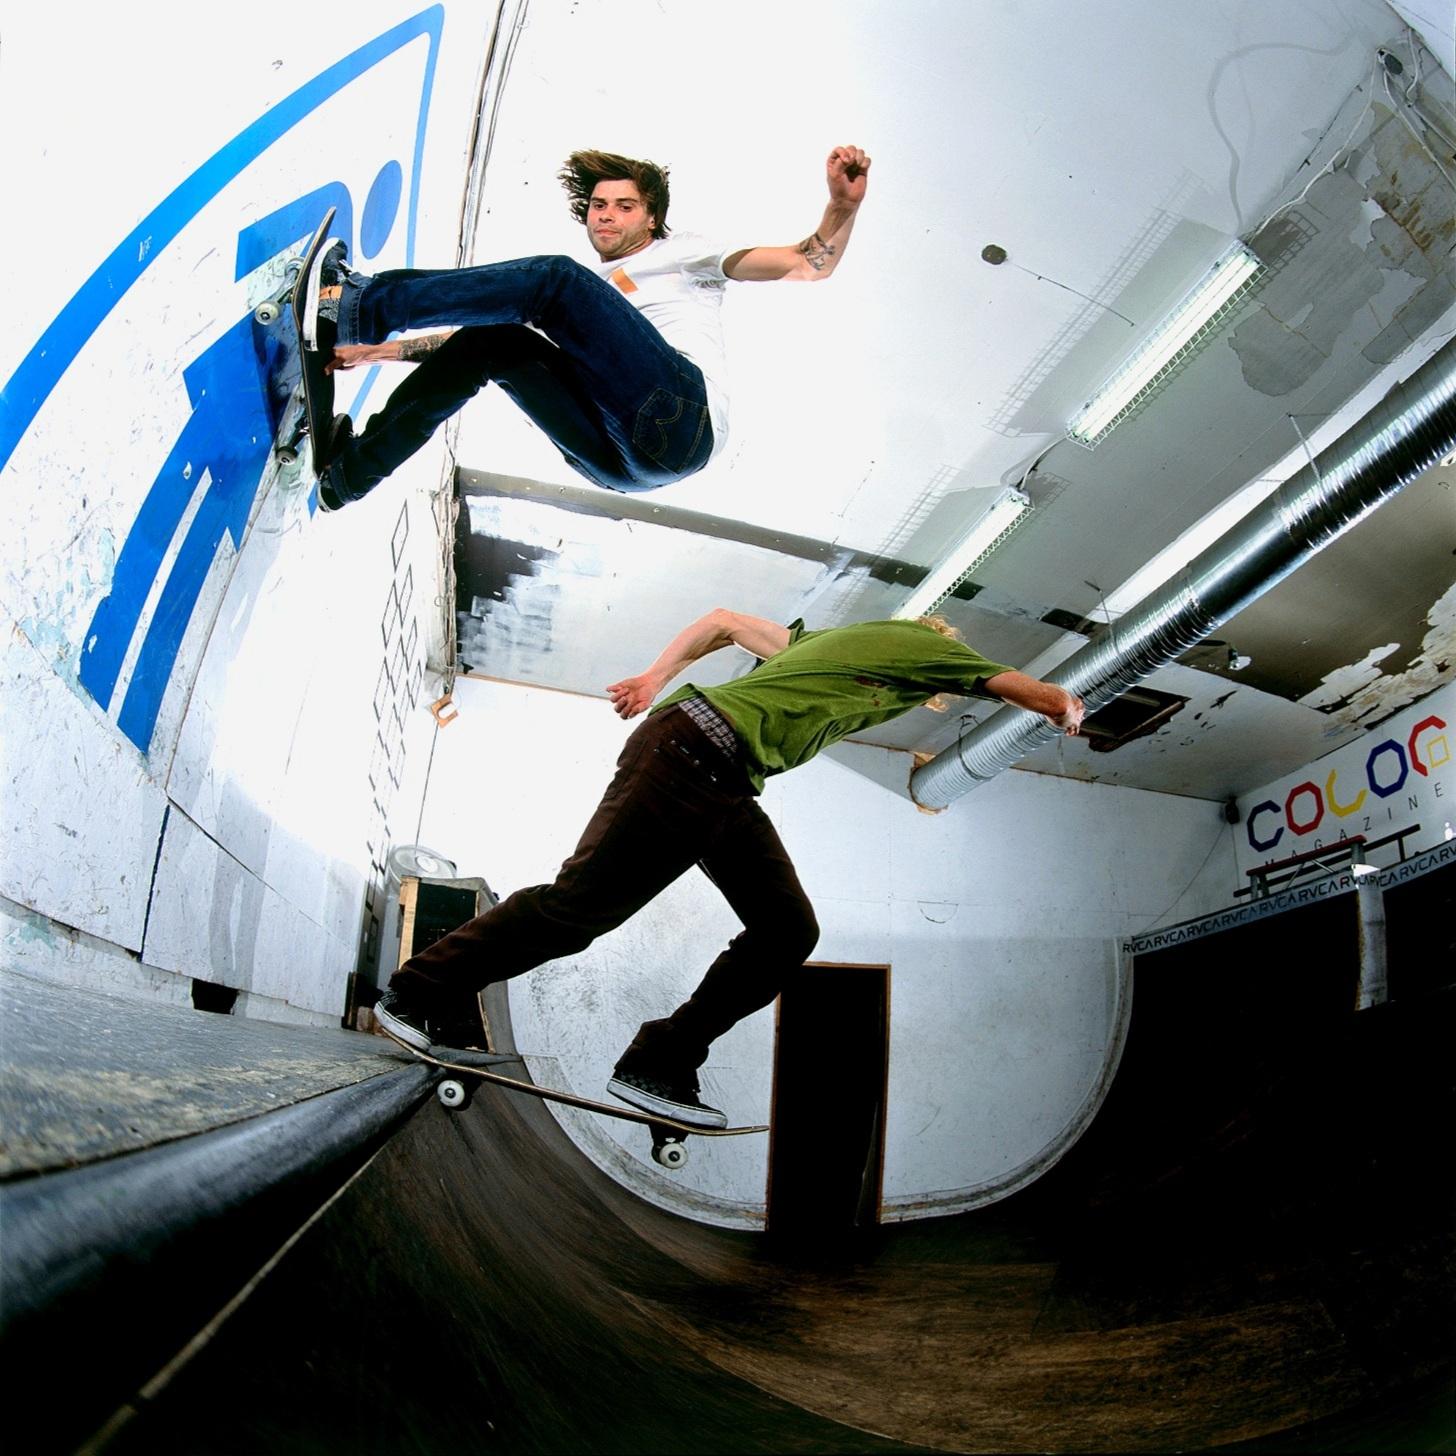 Antisocial Skateboard Shop